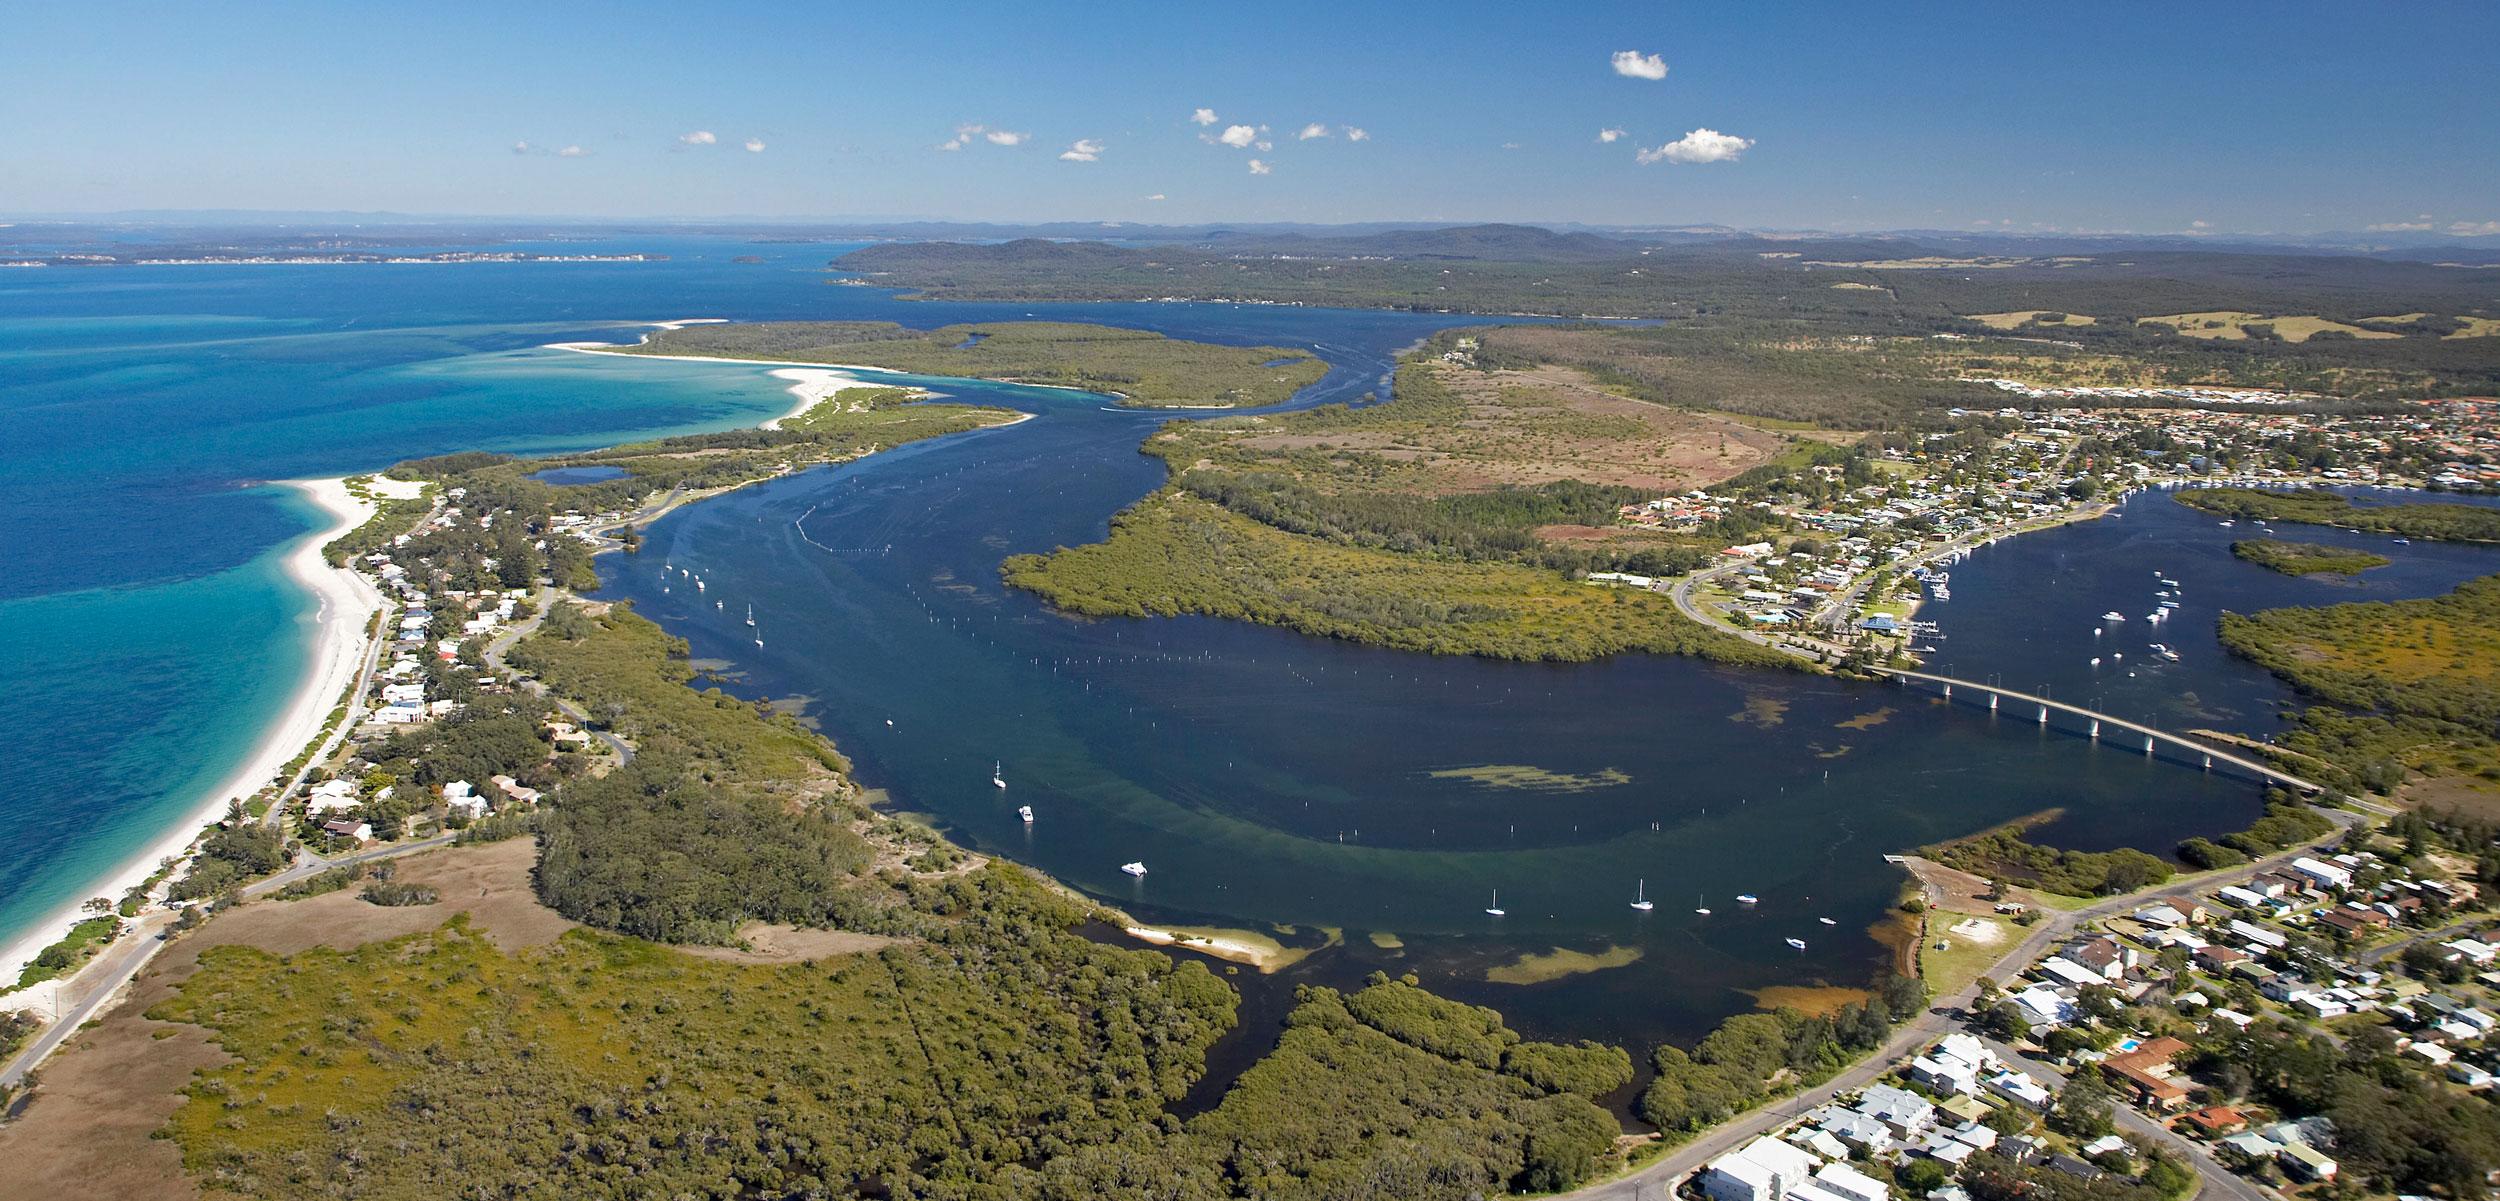 Port Stephens New South Wales Australia